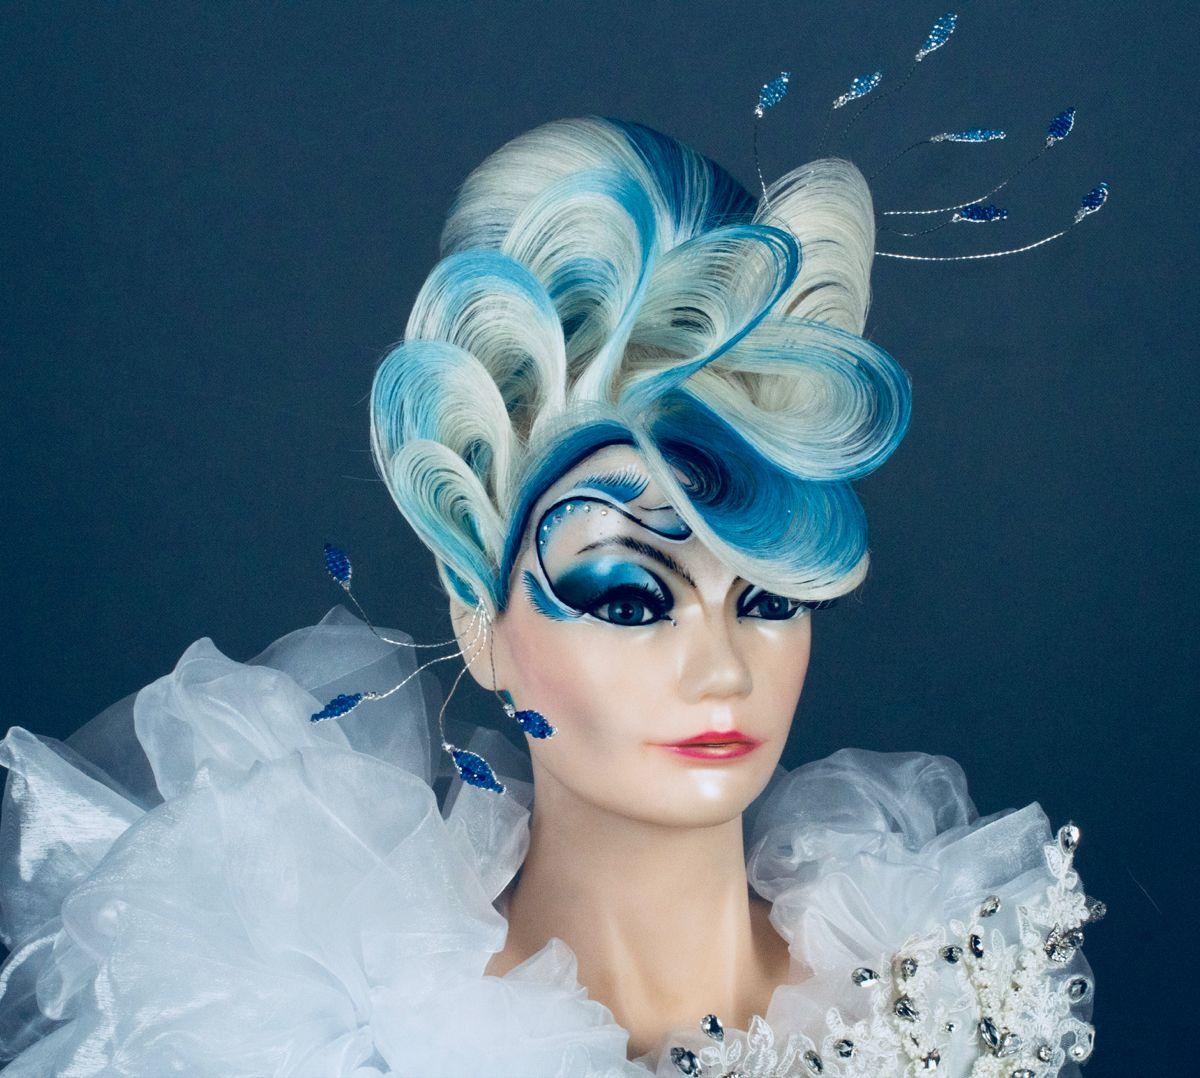 Omc日宴盤髮造型 in 2020 Fairy hair, Competition hair, Hair styles